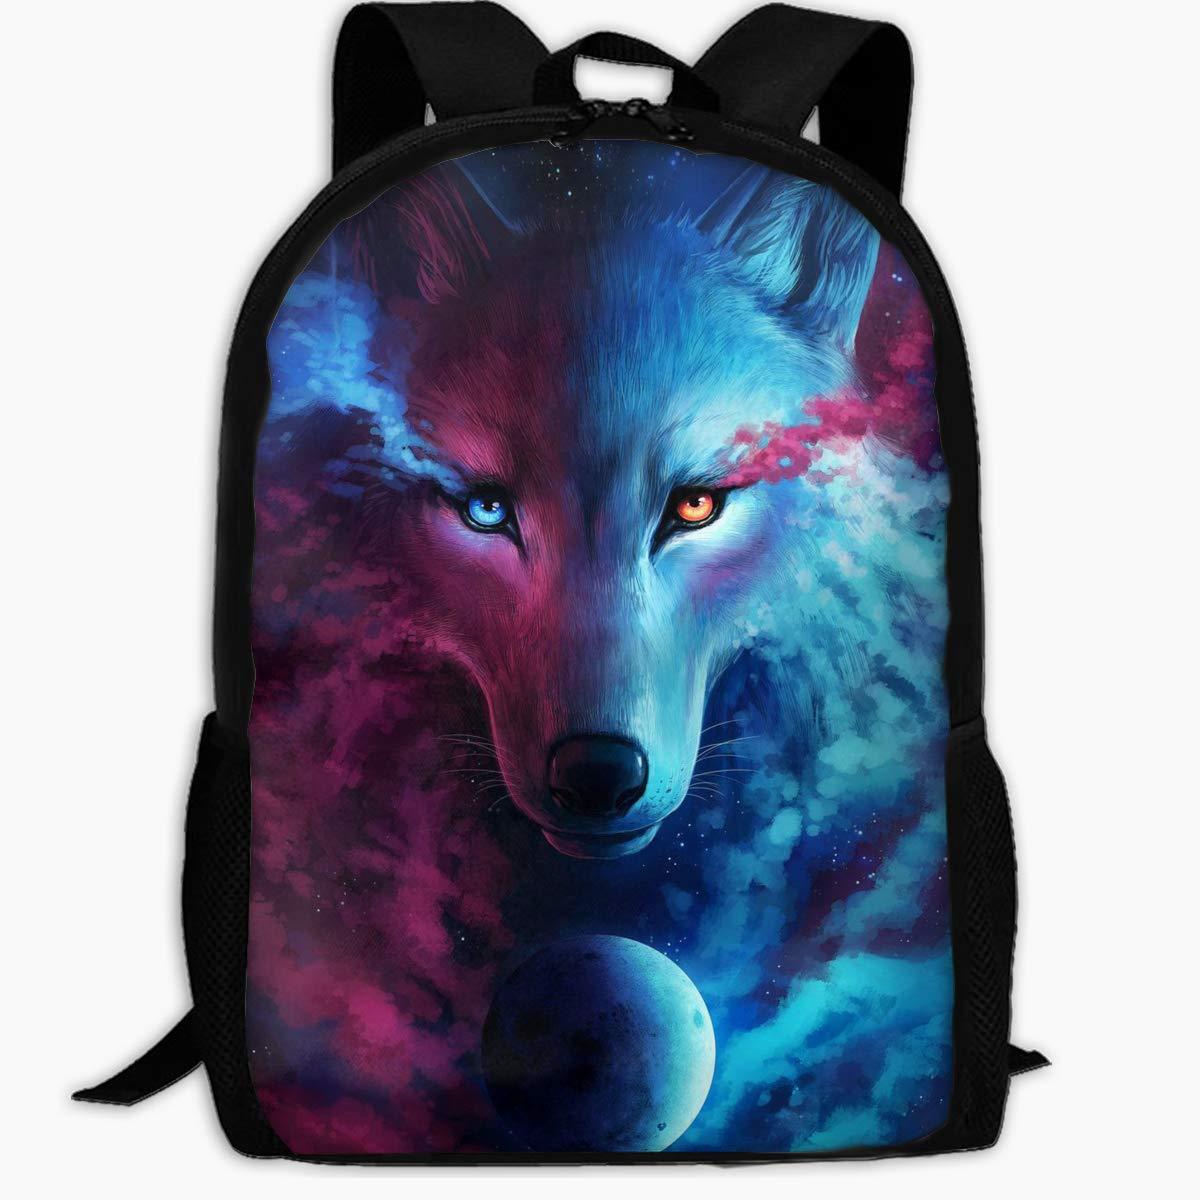 Duwamesva カジュアルバックパック - 美しい温かみと冷たい狼のプリント ジッパー スクールバッグ 旅行 デイパック ノートパソコン バックパック 女の子 男の子   B07H788WSH